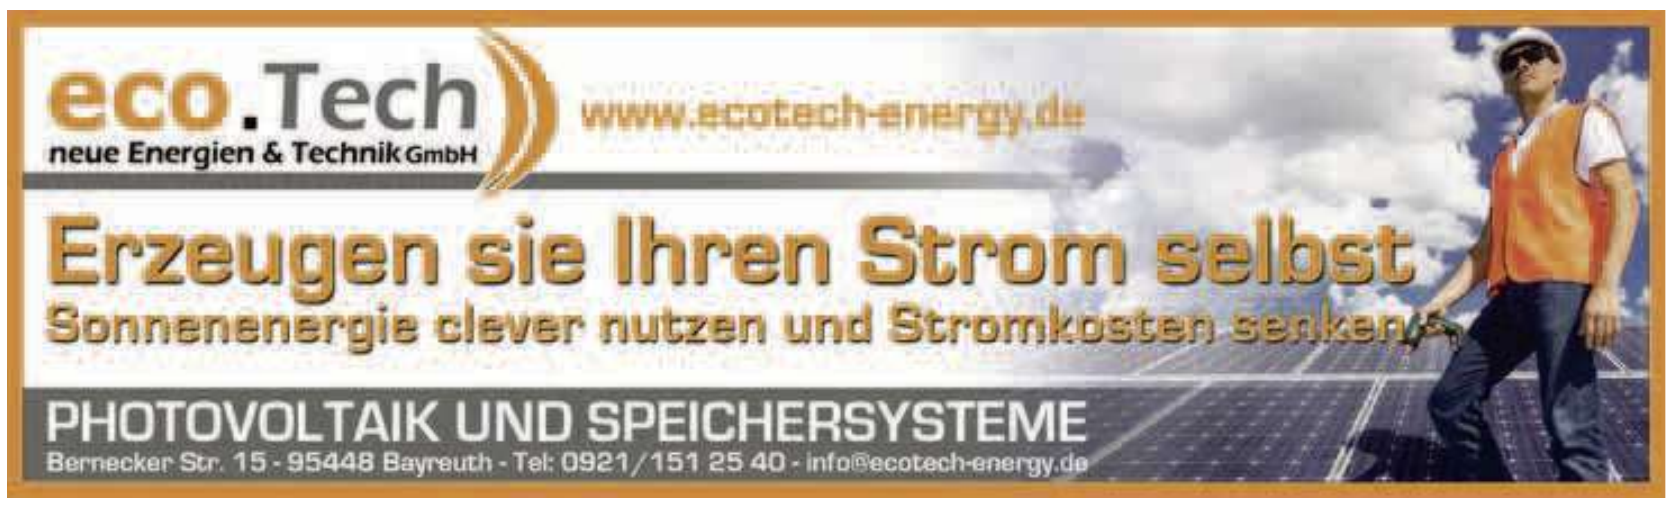 eco.Tech neue Energien & Technik GmbH